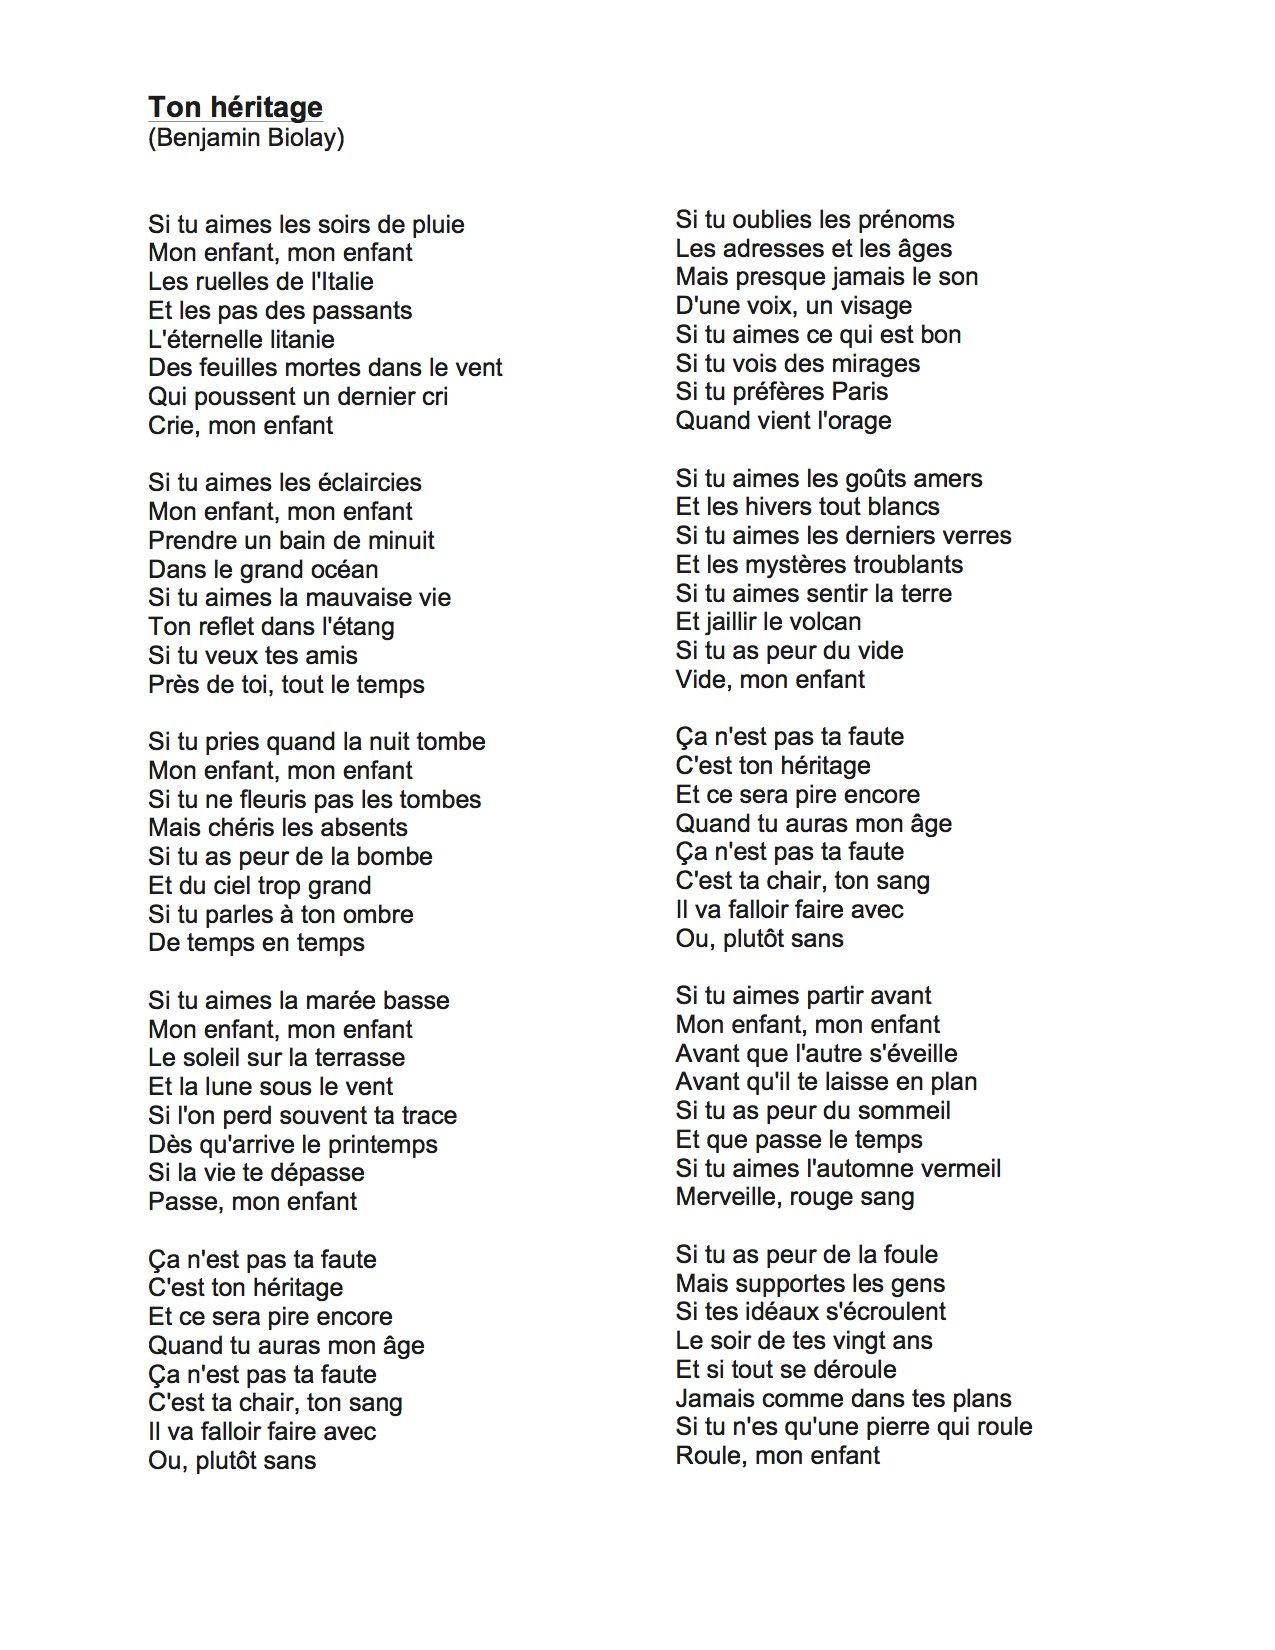 Benjamin biolay ton h ritage citations pinterest for Dans banga paroles